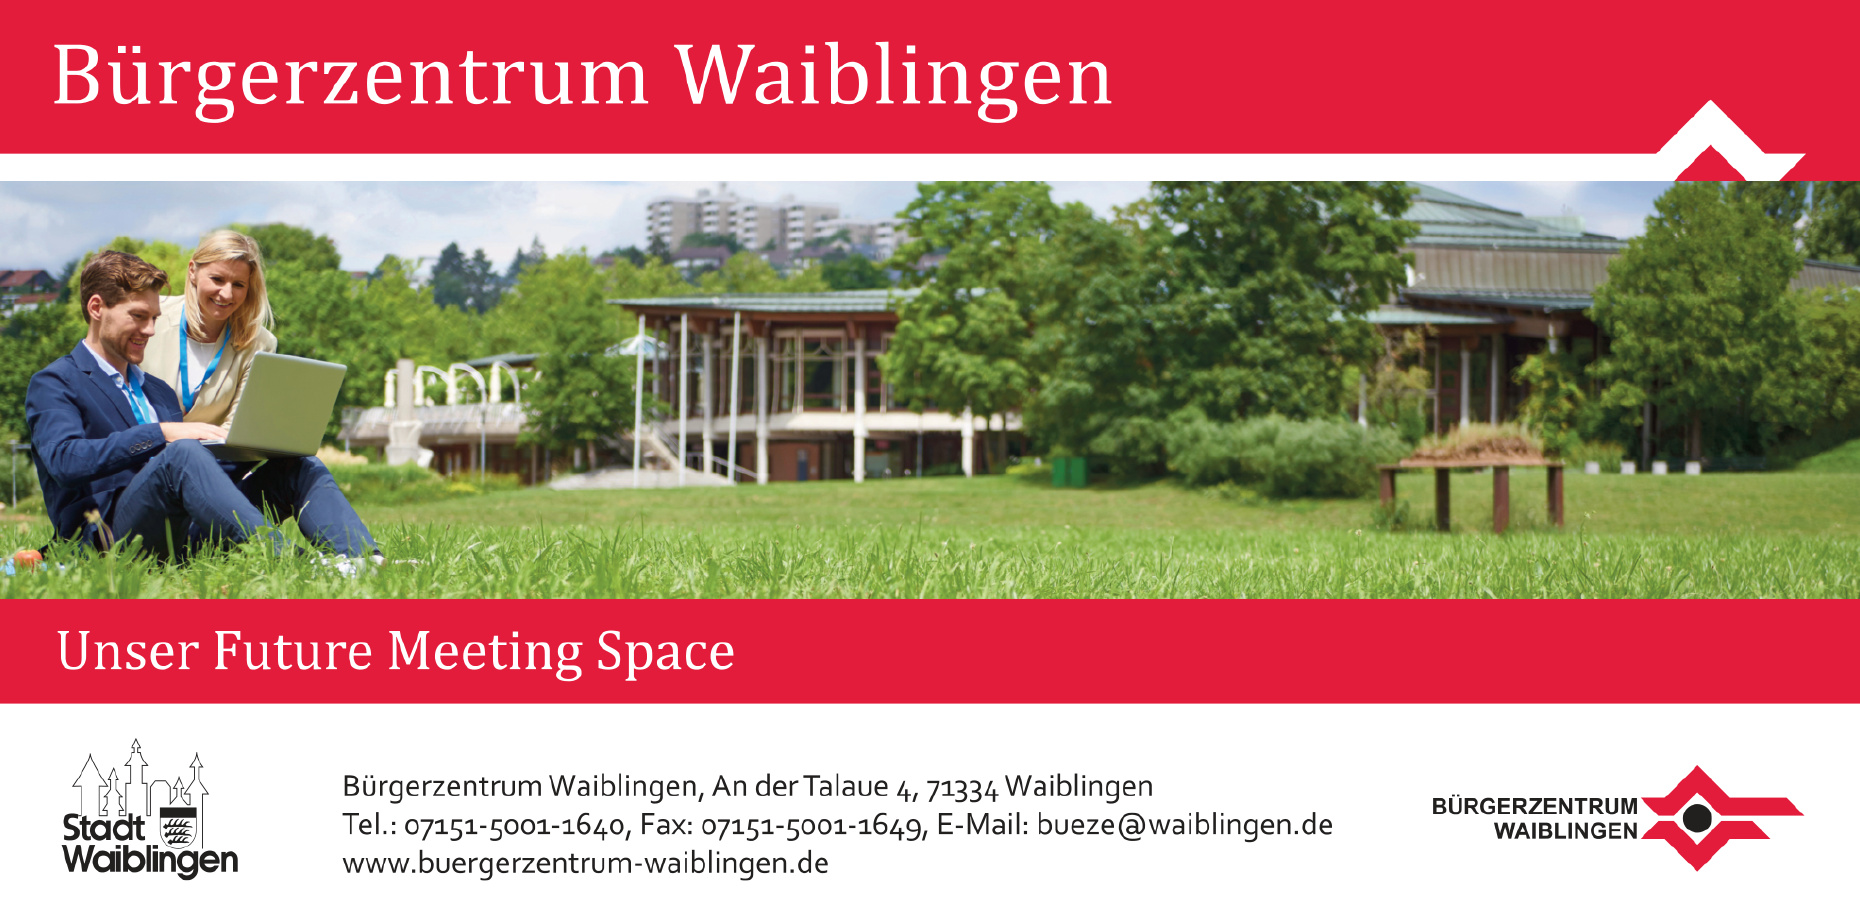 Bürgerzentrum Waiblingen